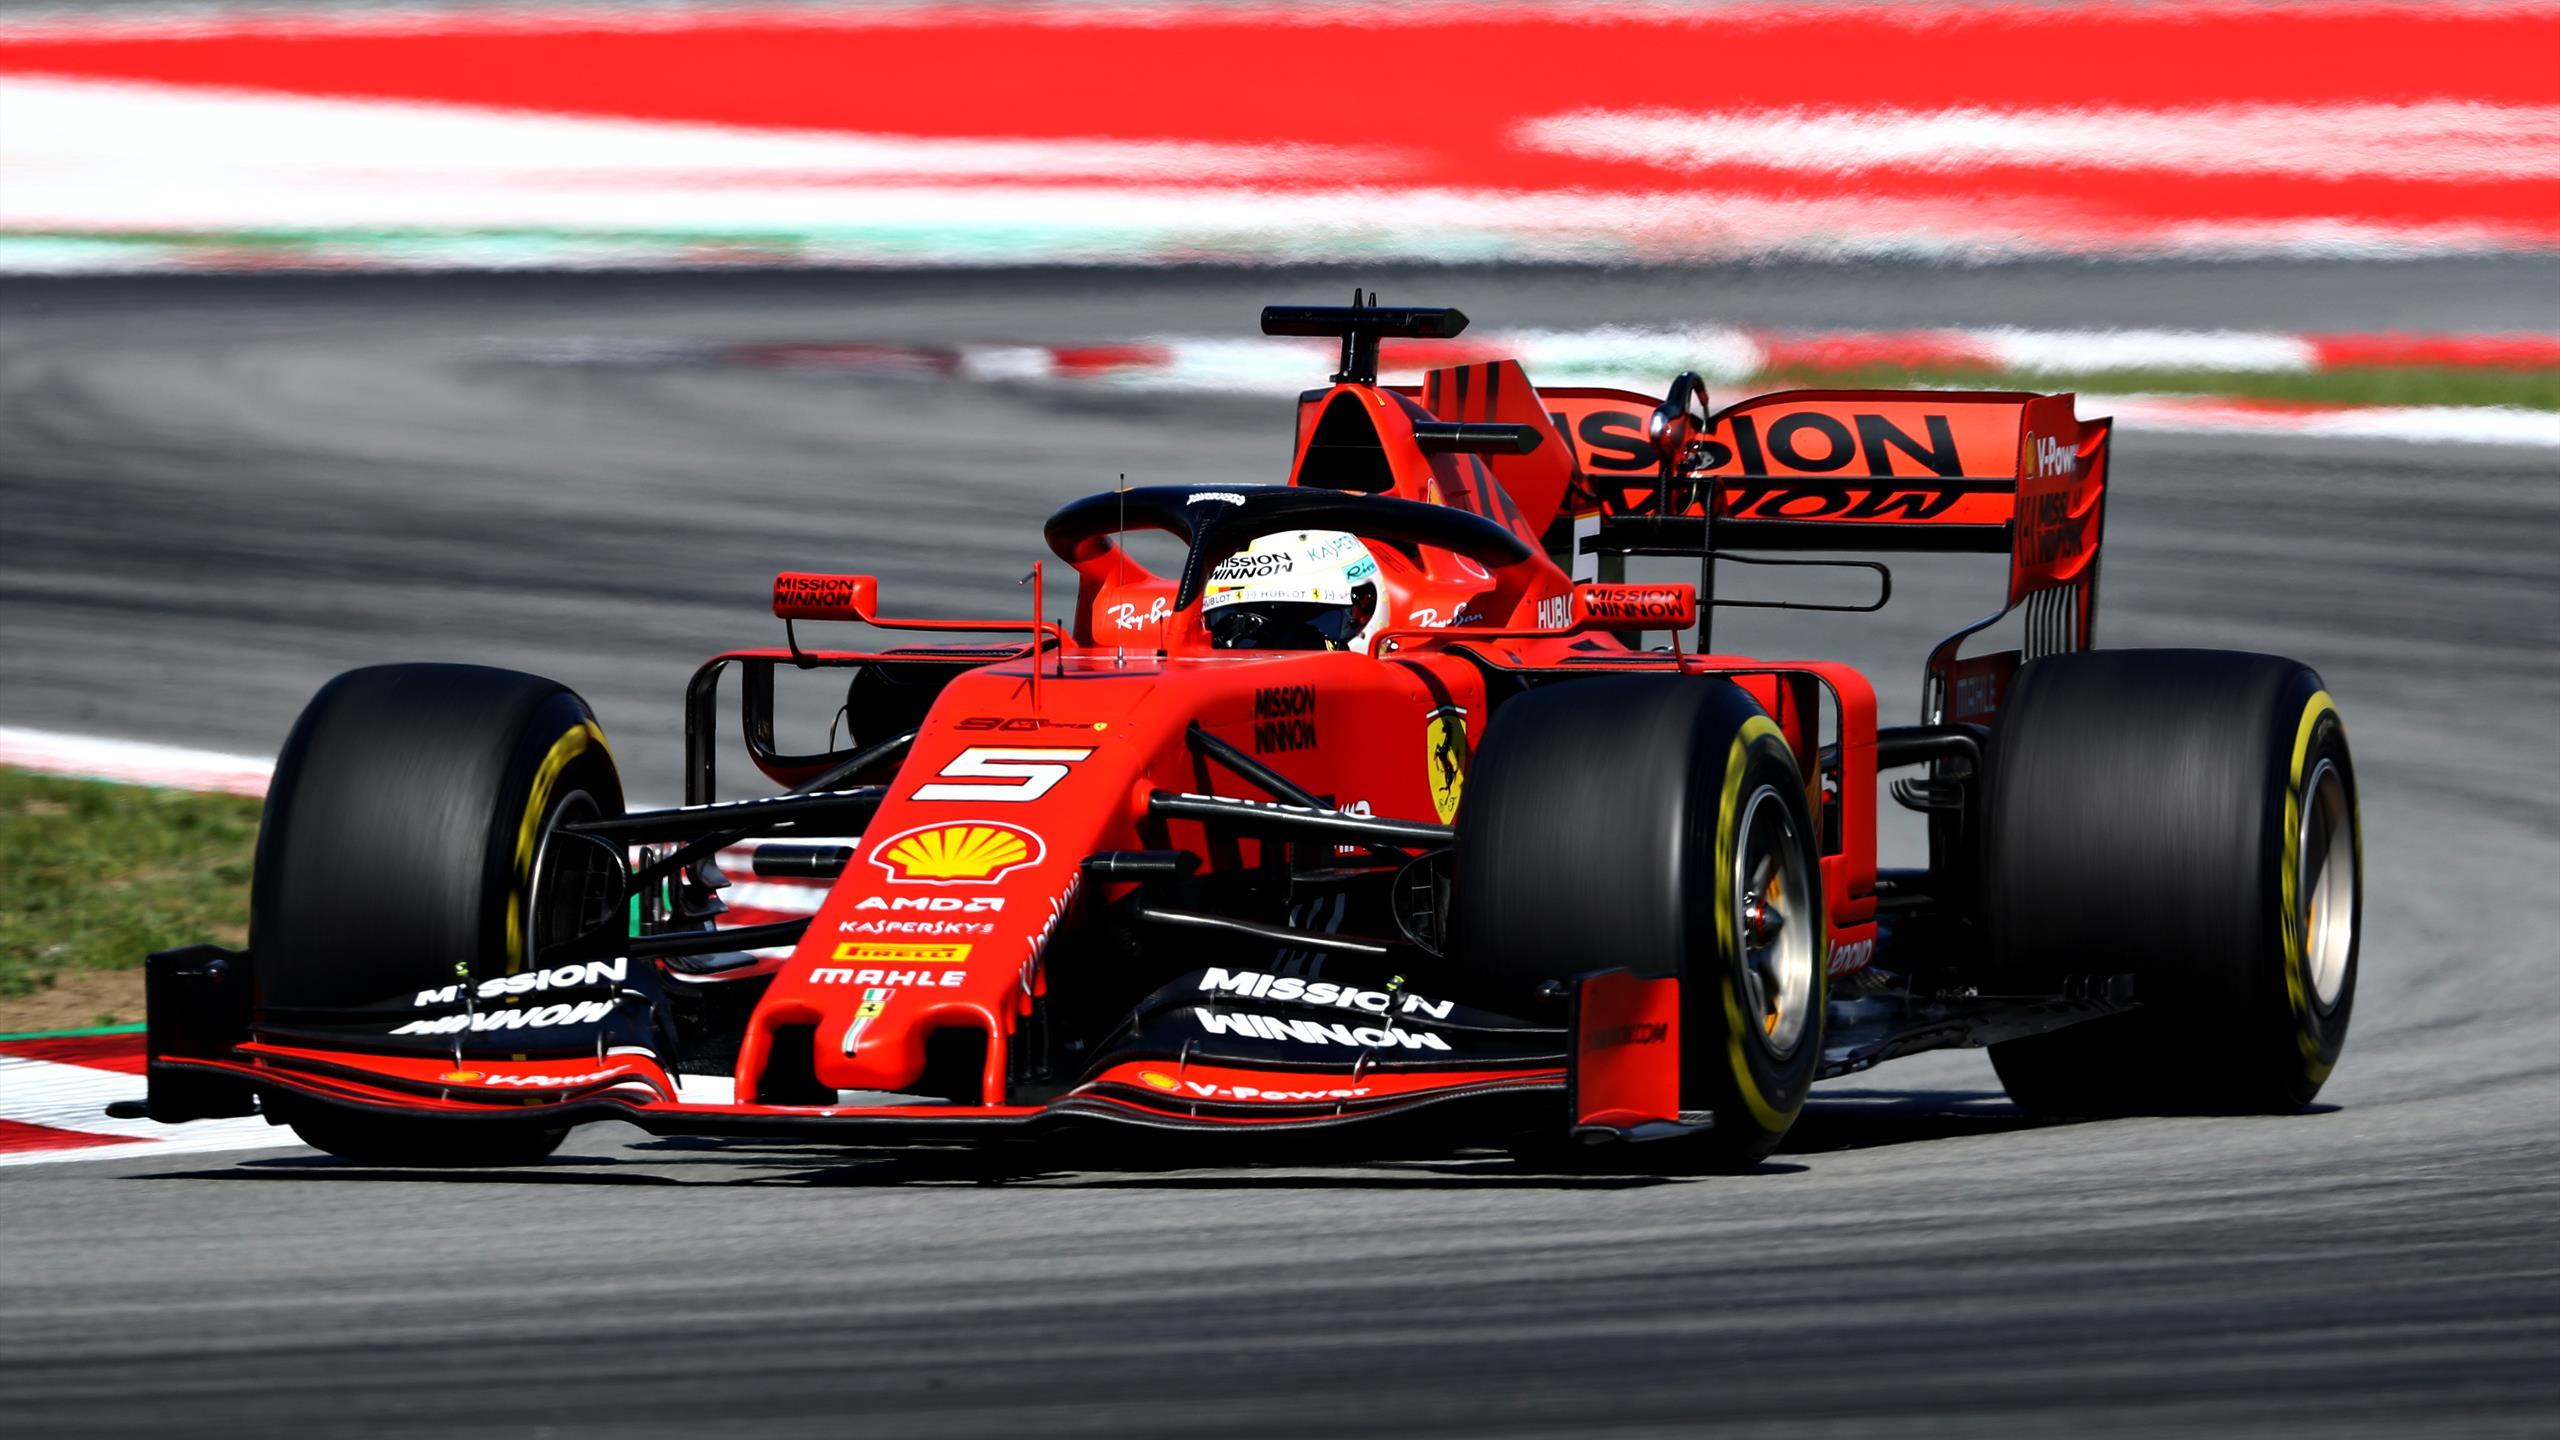 Formel 1 2019 Im Tv